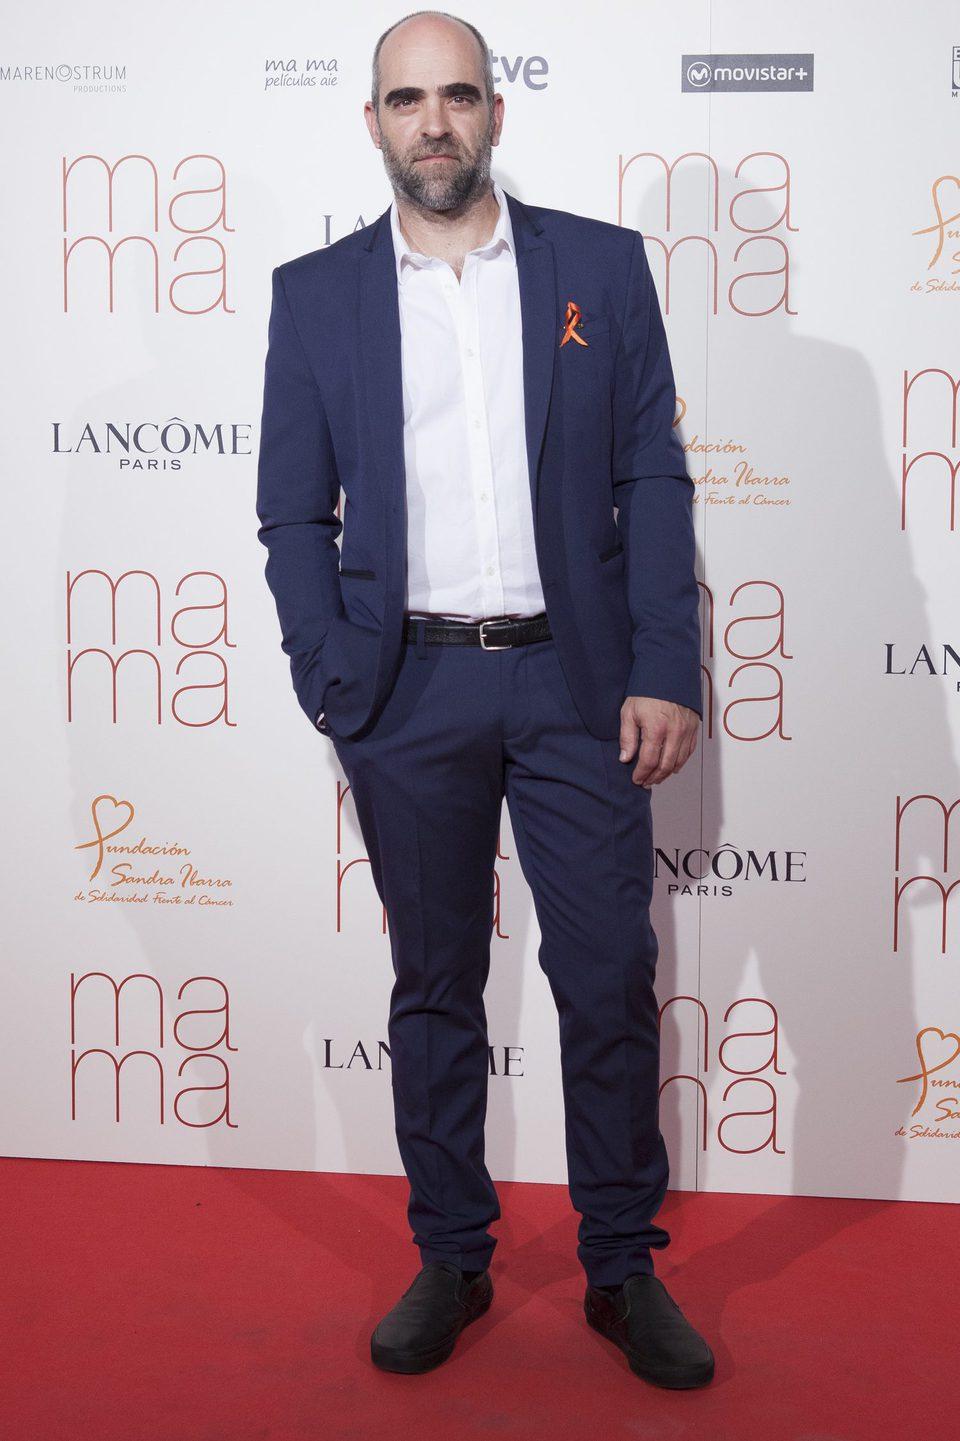 Luis Tosar en la premiere de 'Ma ma' en Madrid